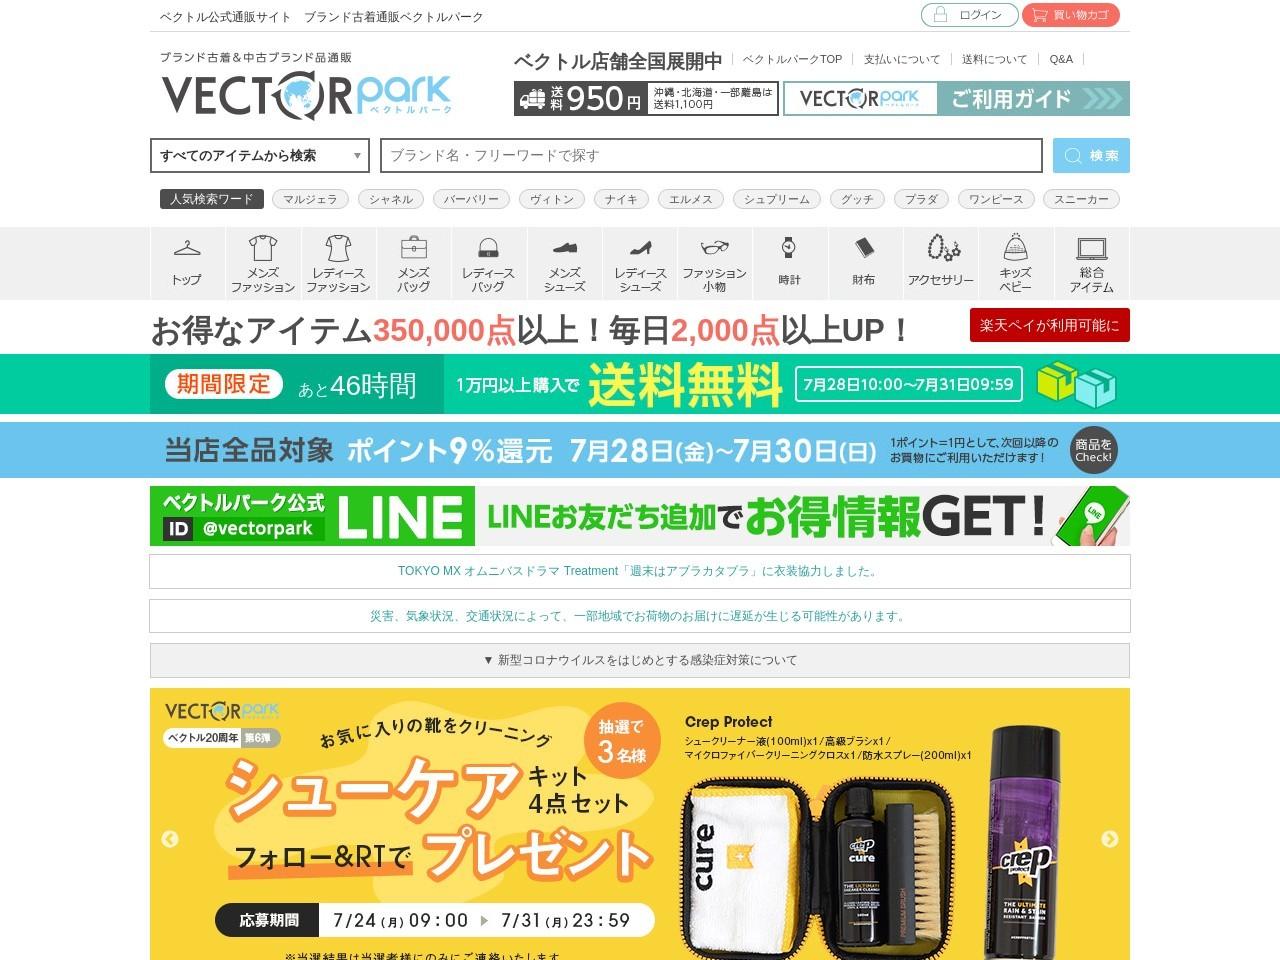 https://vector-park.jp/list/?kw=%A5%C8%A5%EA%A1%BC%A5%D0%A1%BC%A5%C1+TORY+BURCH